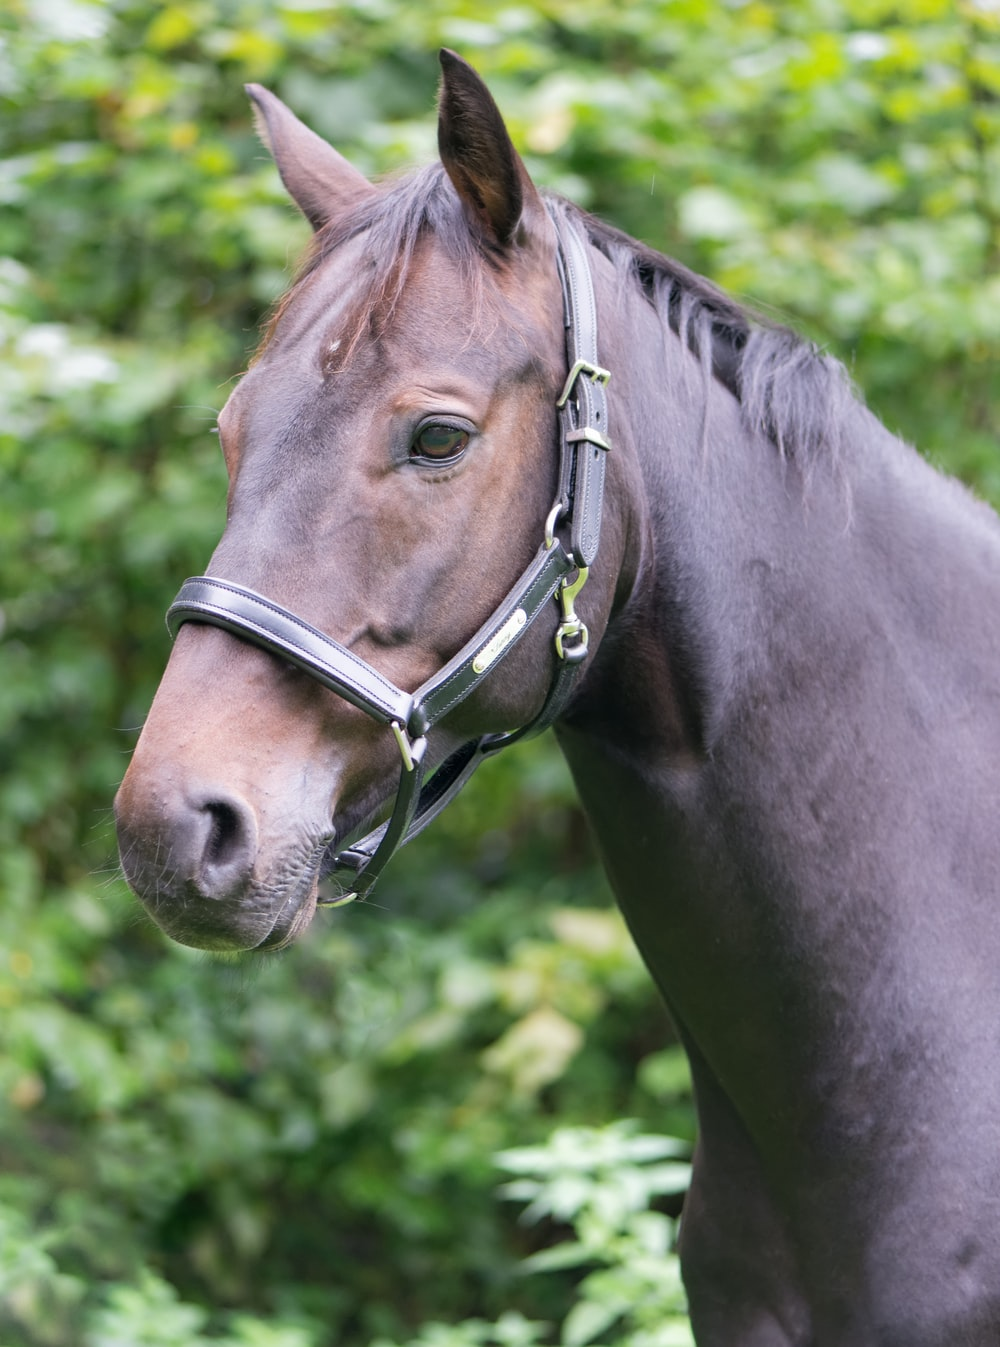 closeup photo of horse near trees